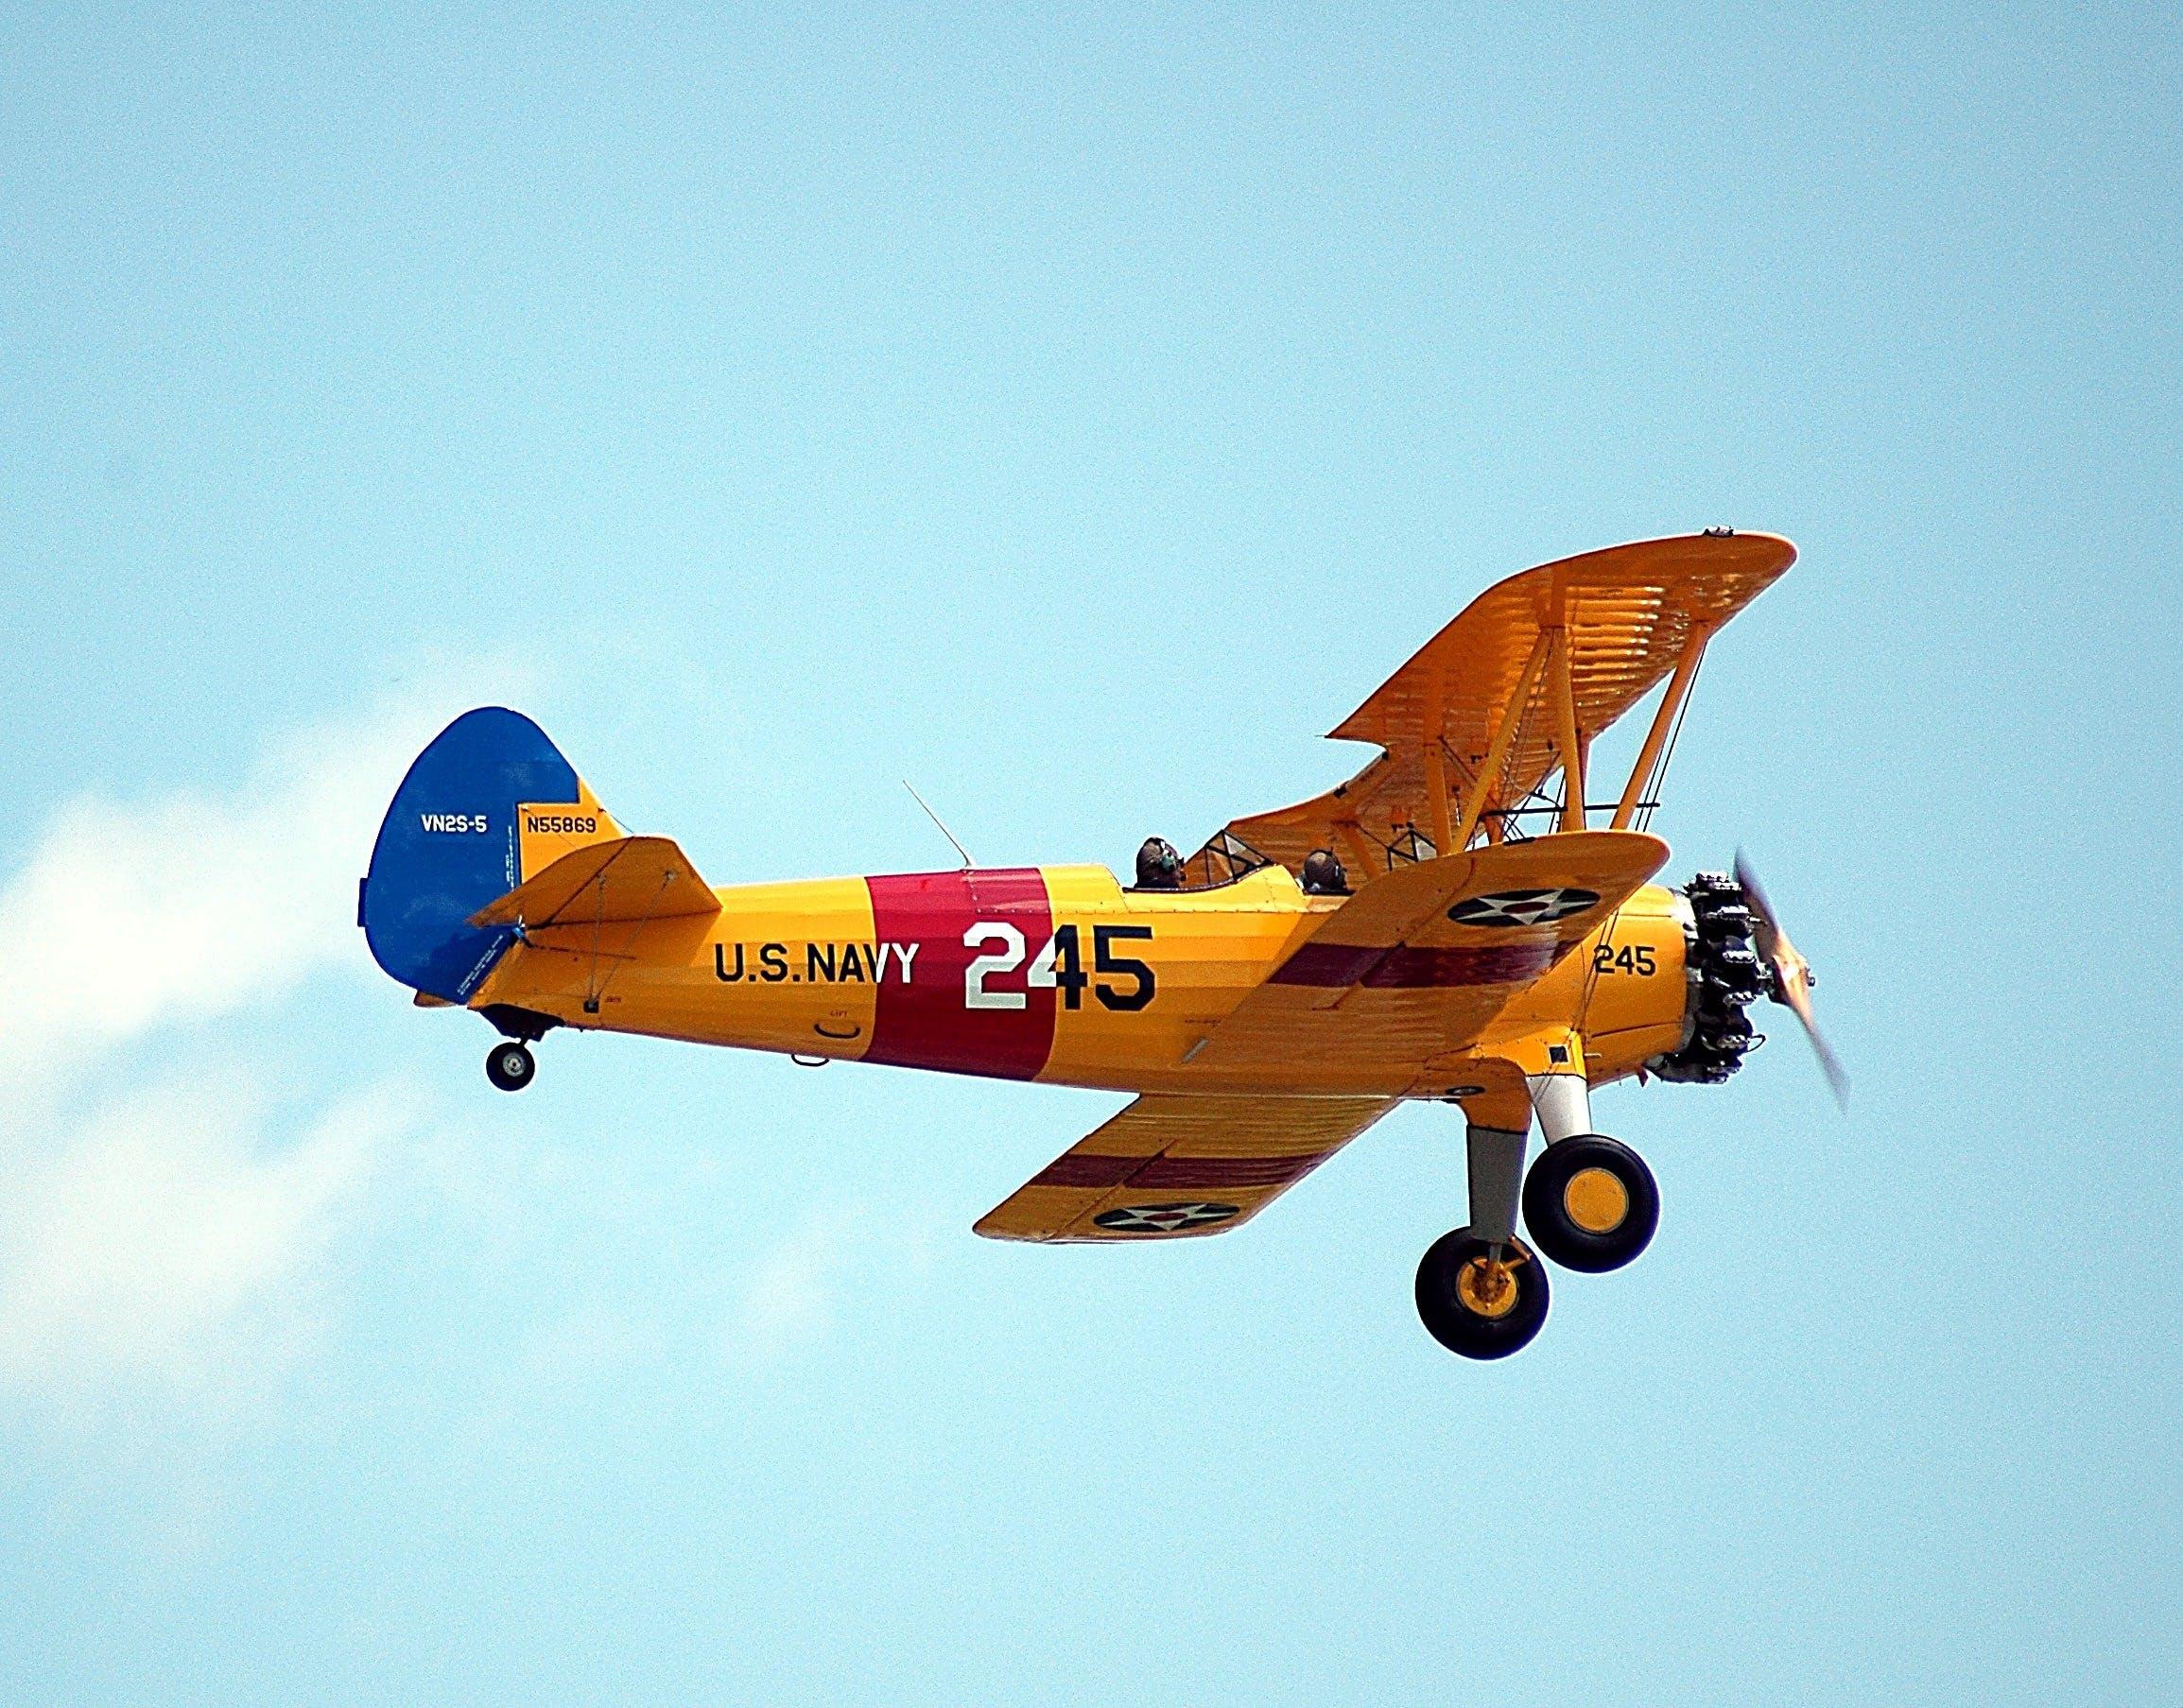 Airplane Flying Against Sky